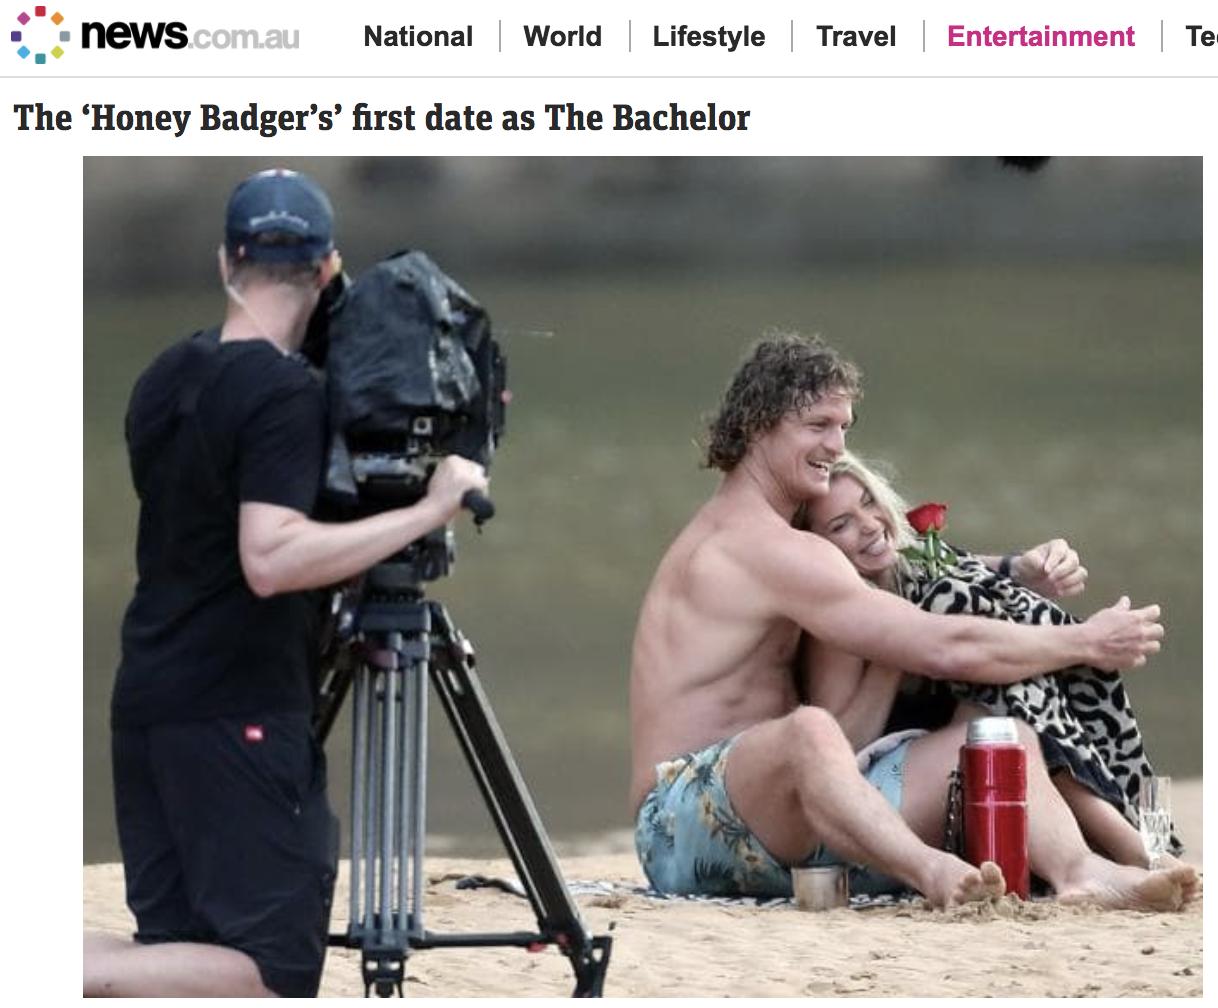 The Bachelor paparrazi photo (news.com.au) [2]